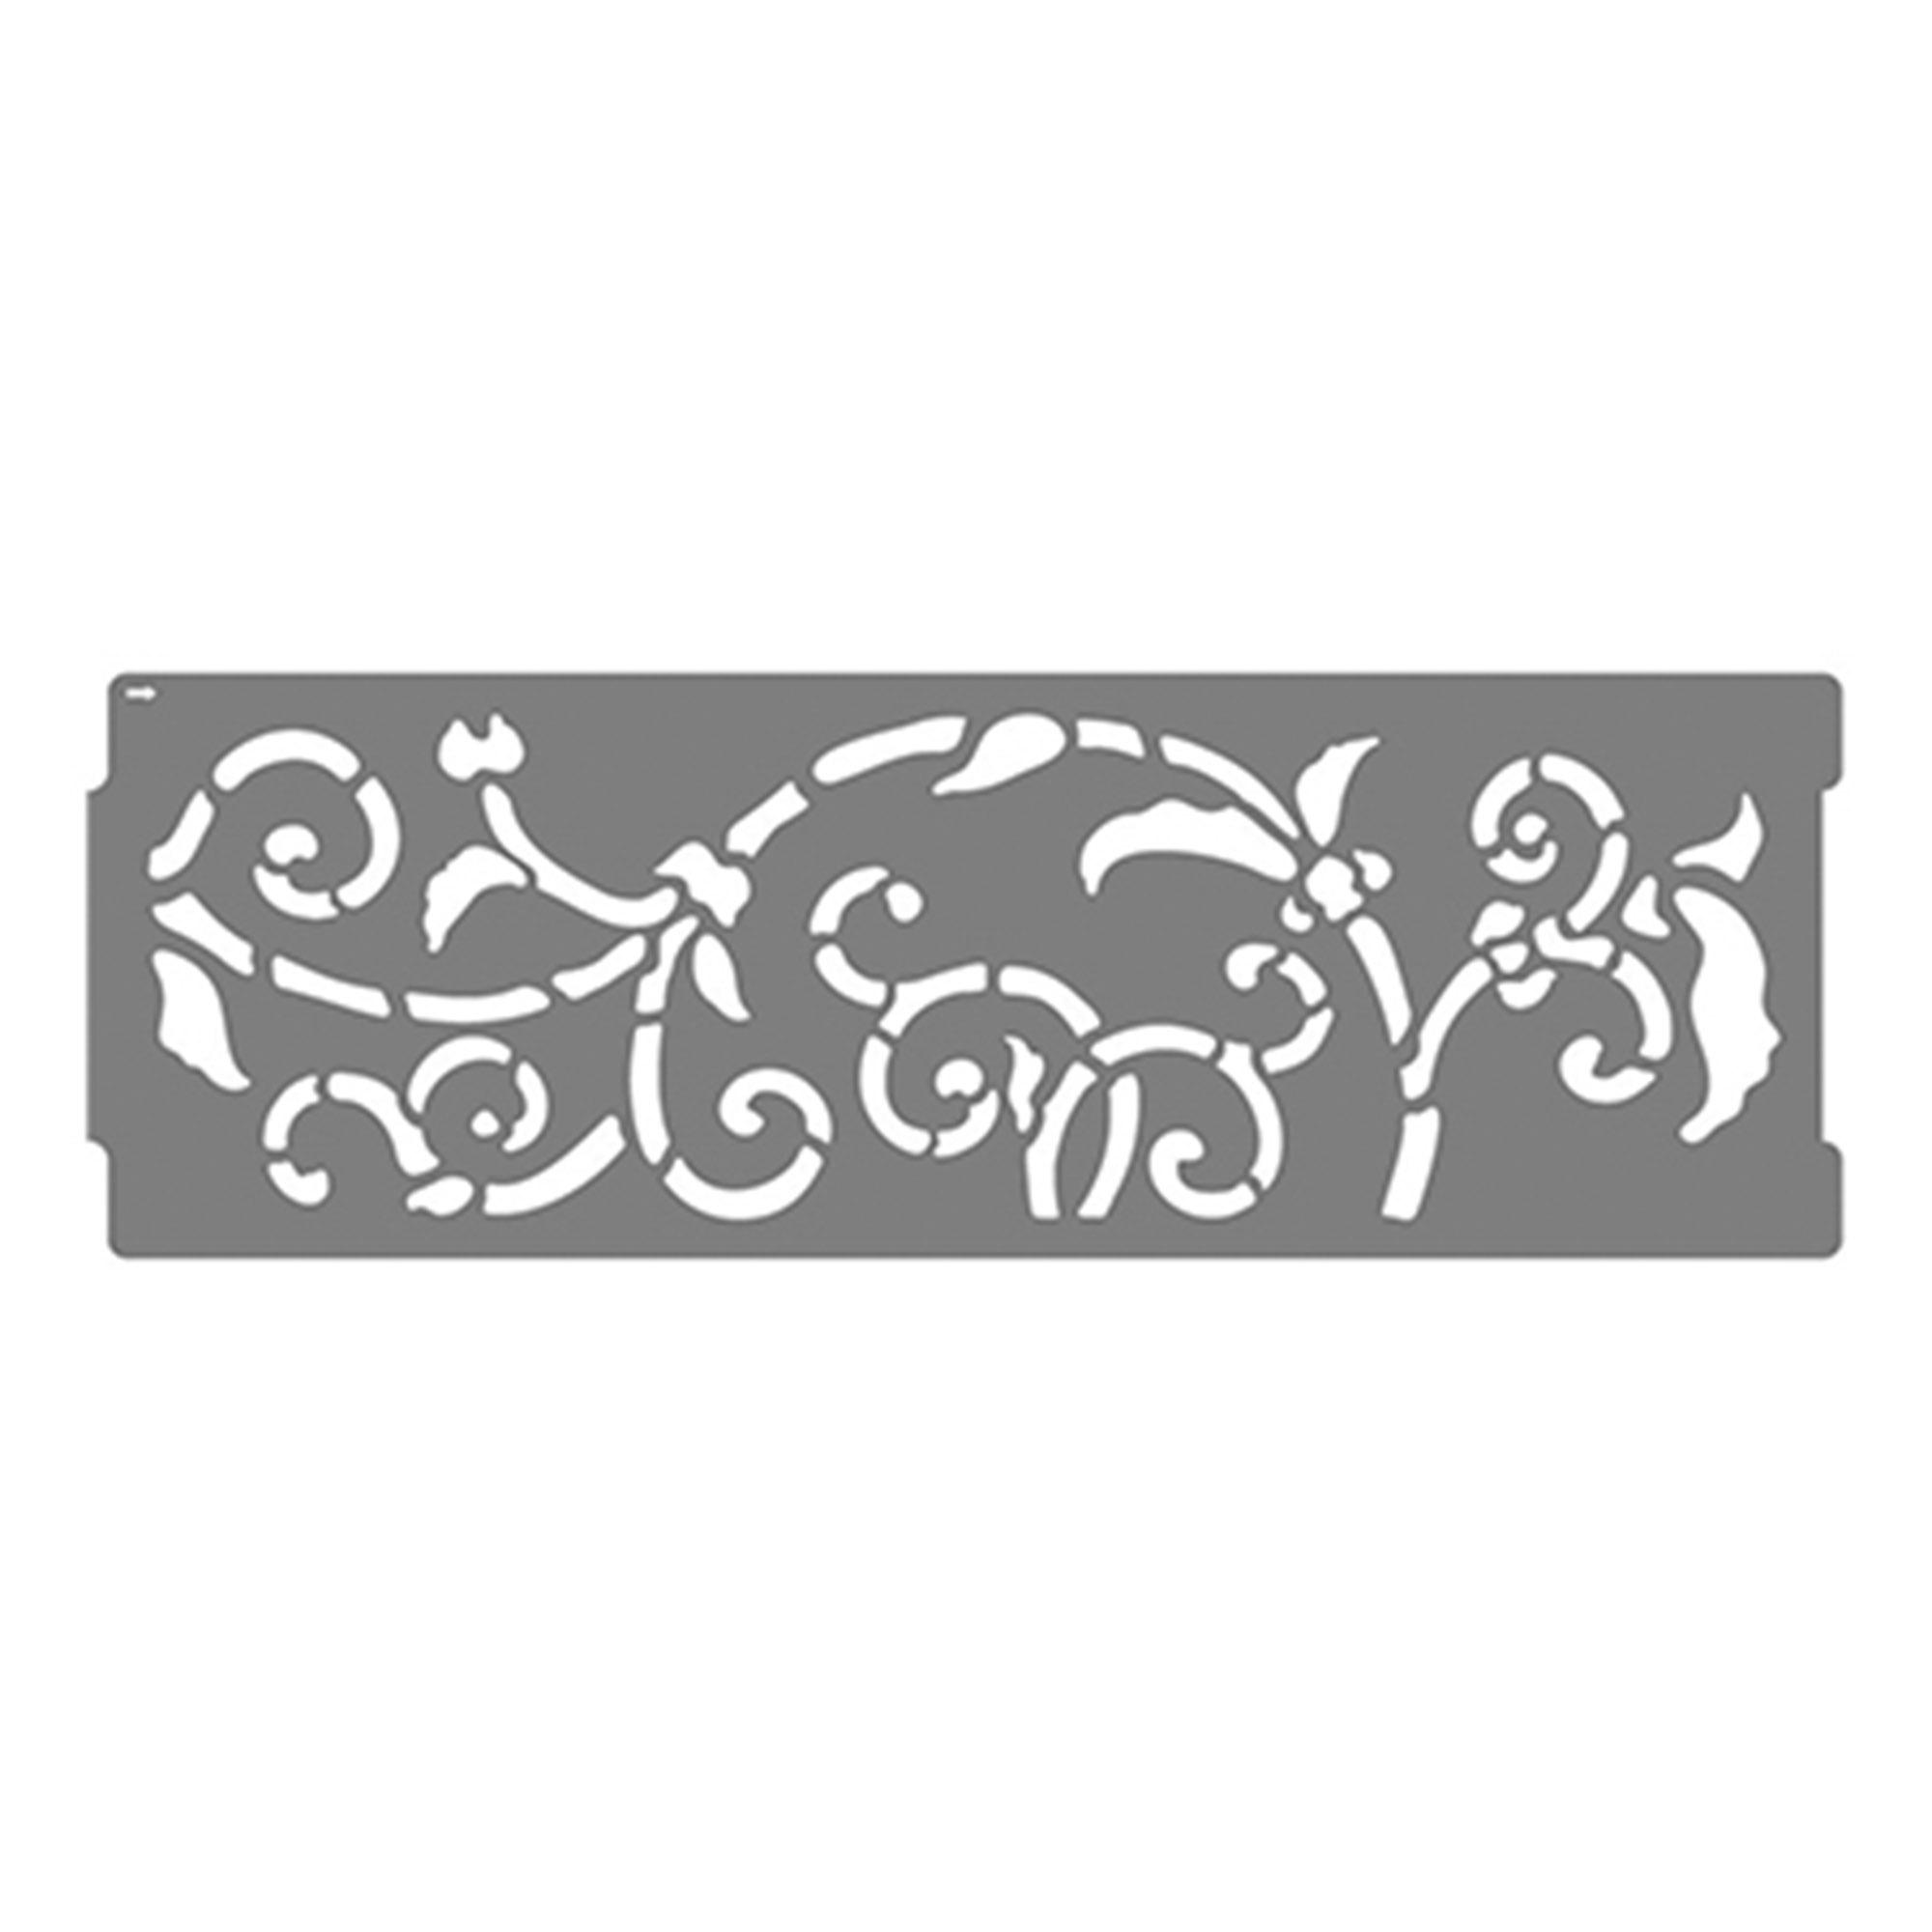 Трафарет бордюр Artdecor Ковка арт.10606